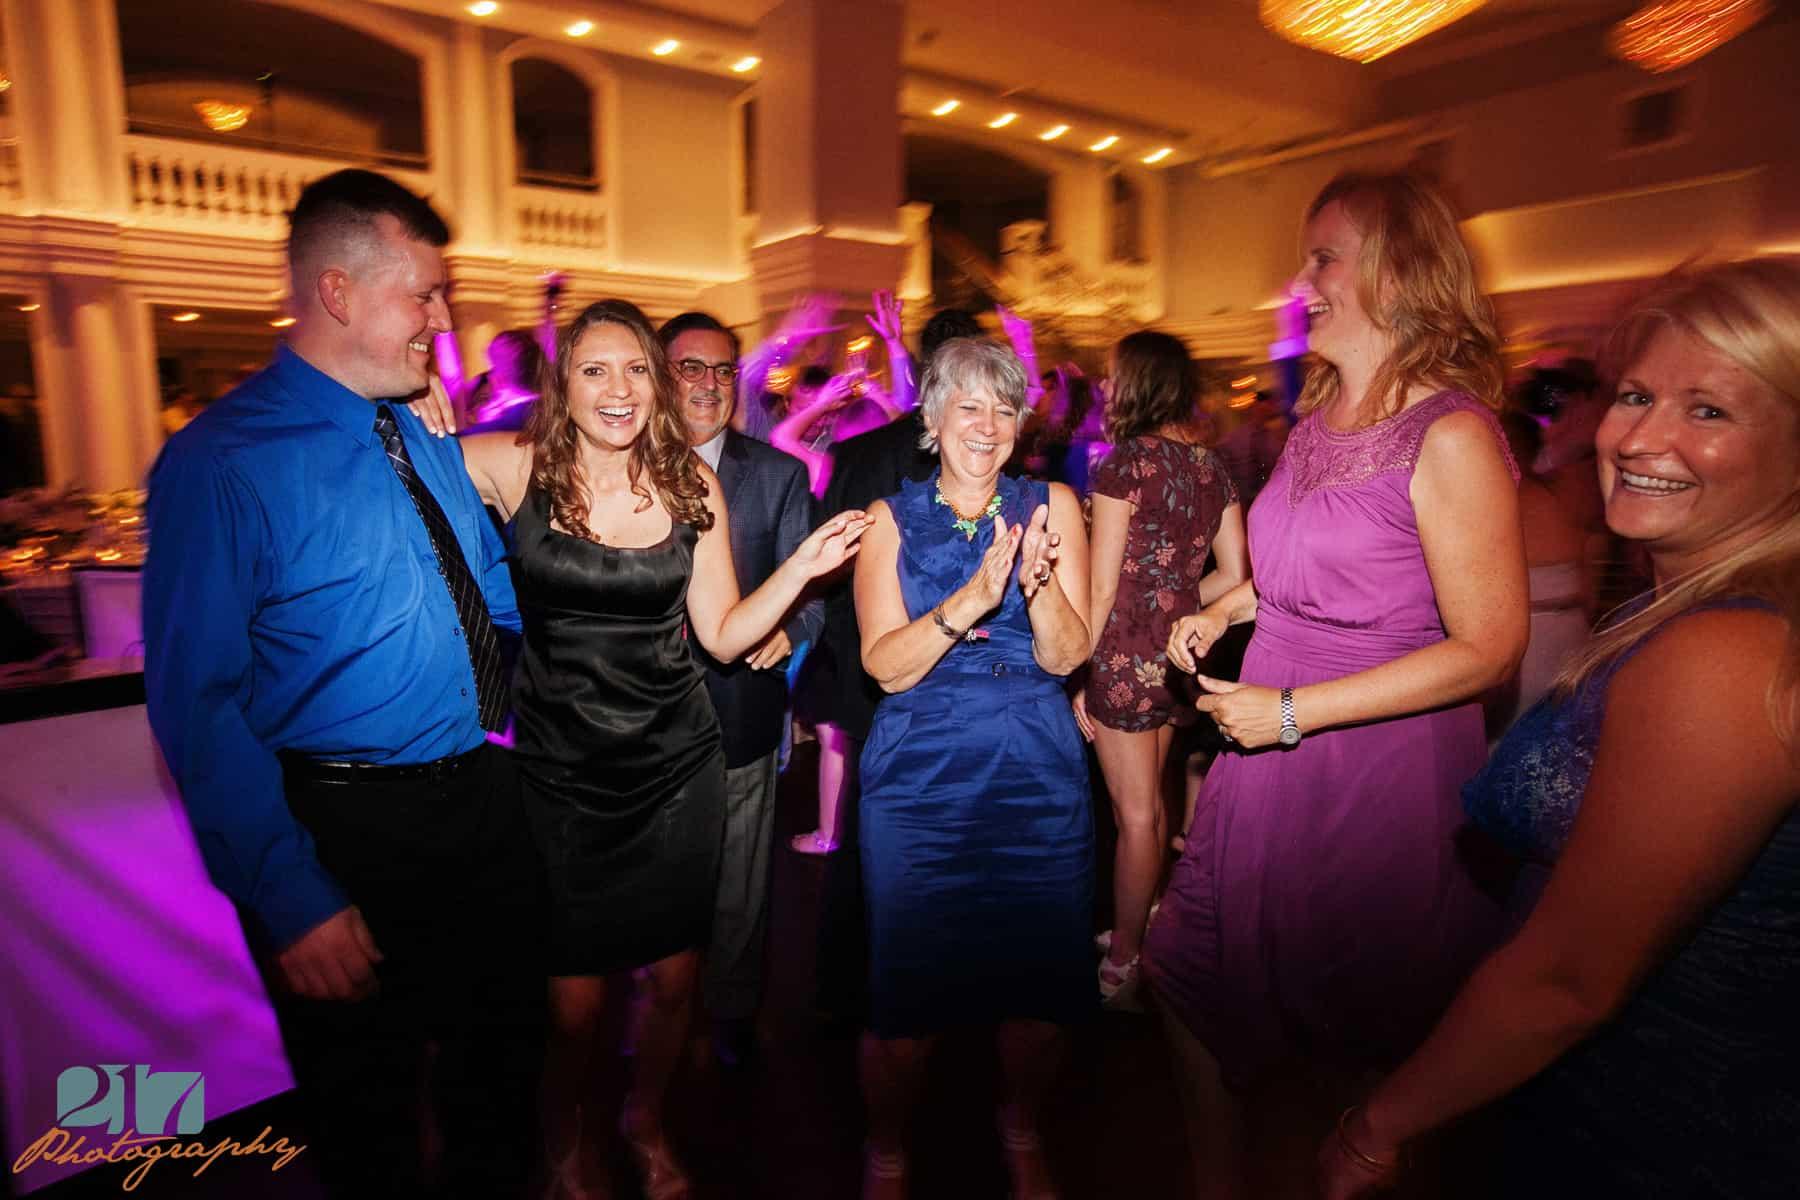 Dancing at Arts Ballroom wedding reception